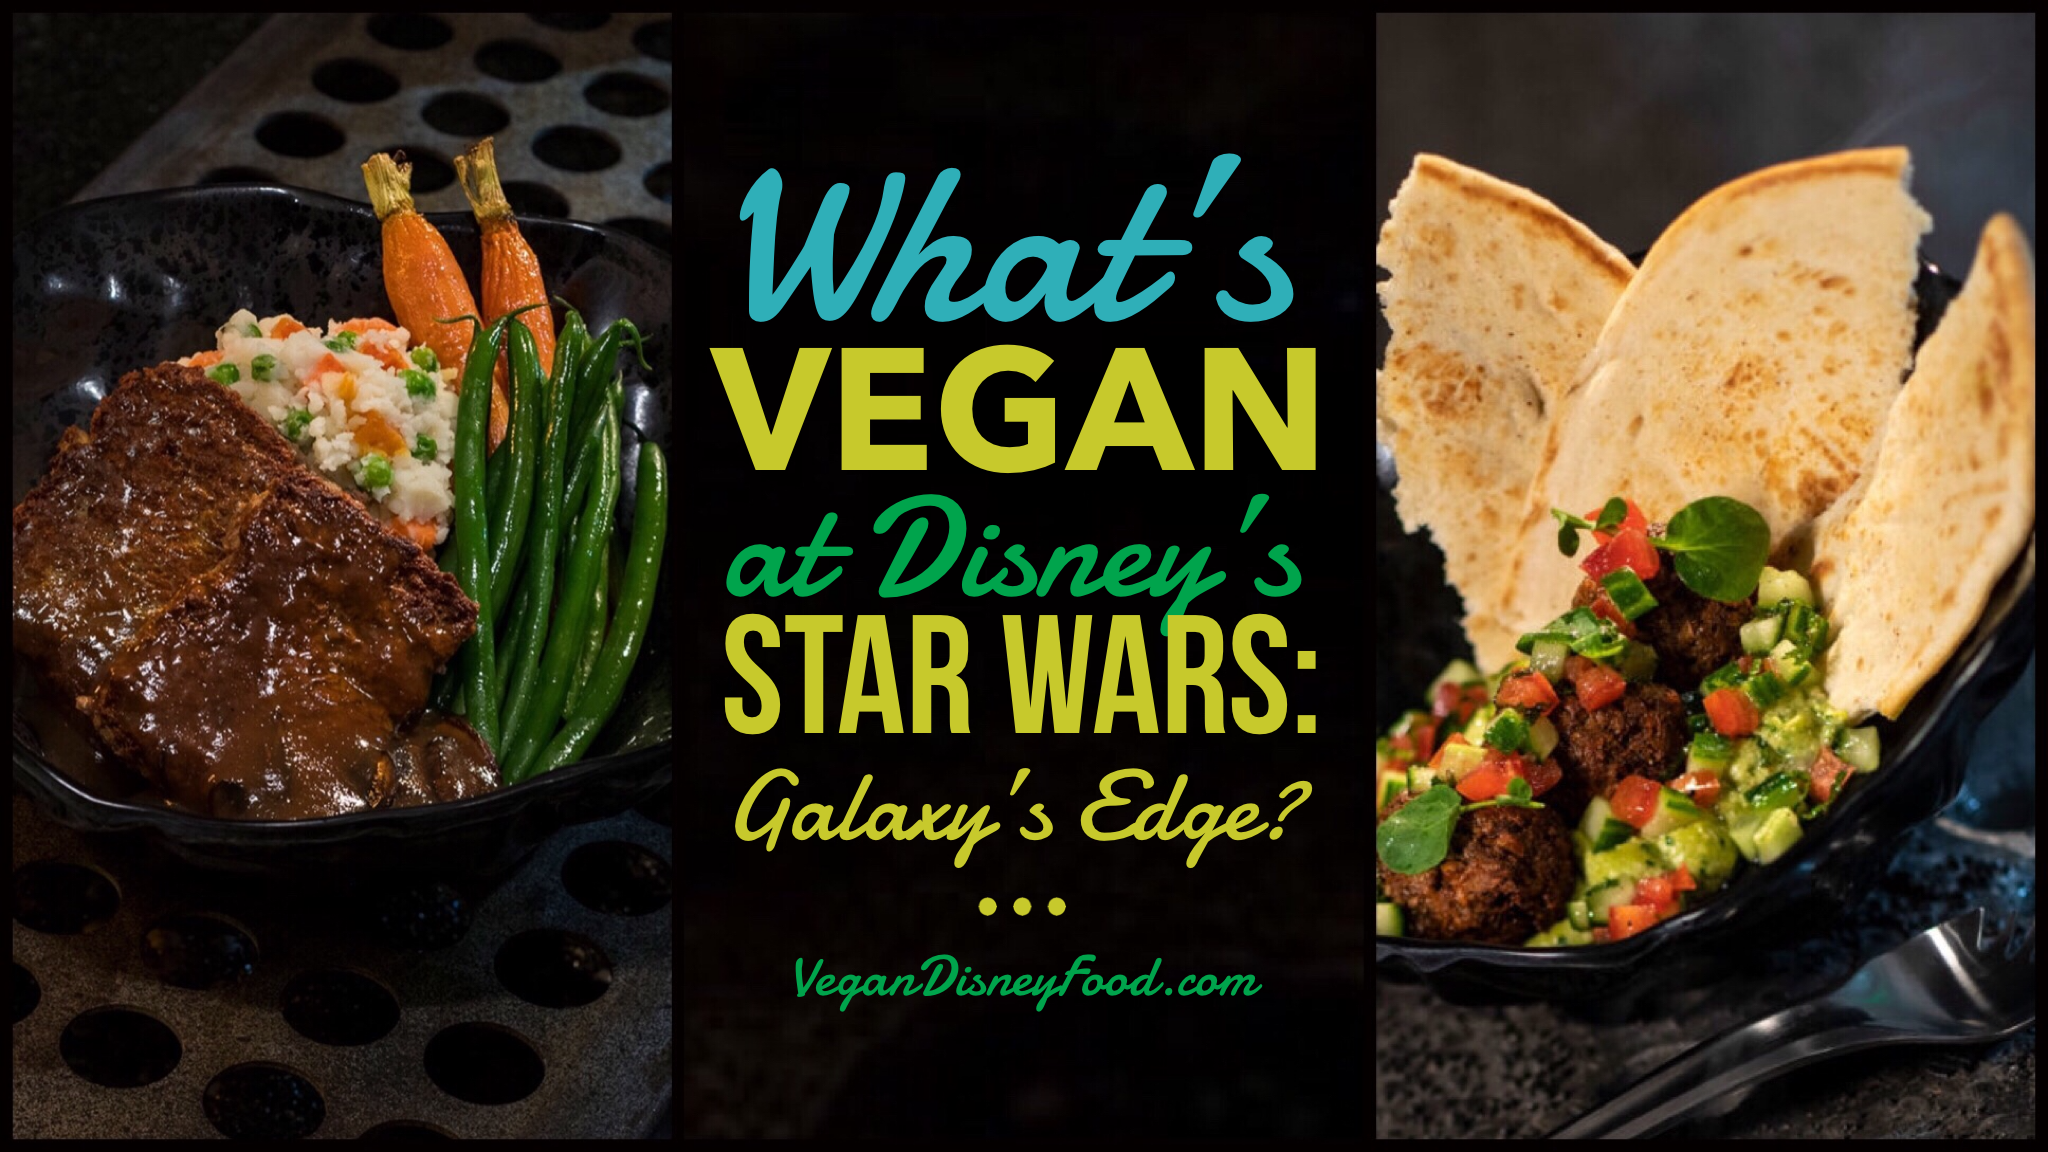 What's Vegan At Disney's Star Wars: Galaxy's Edge?